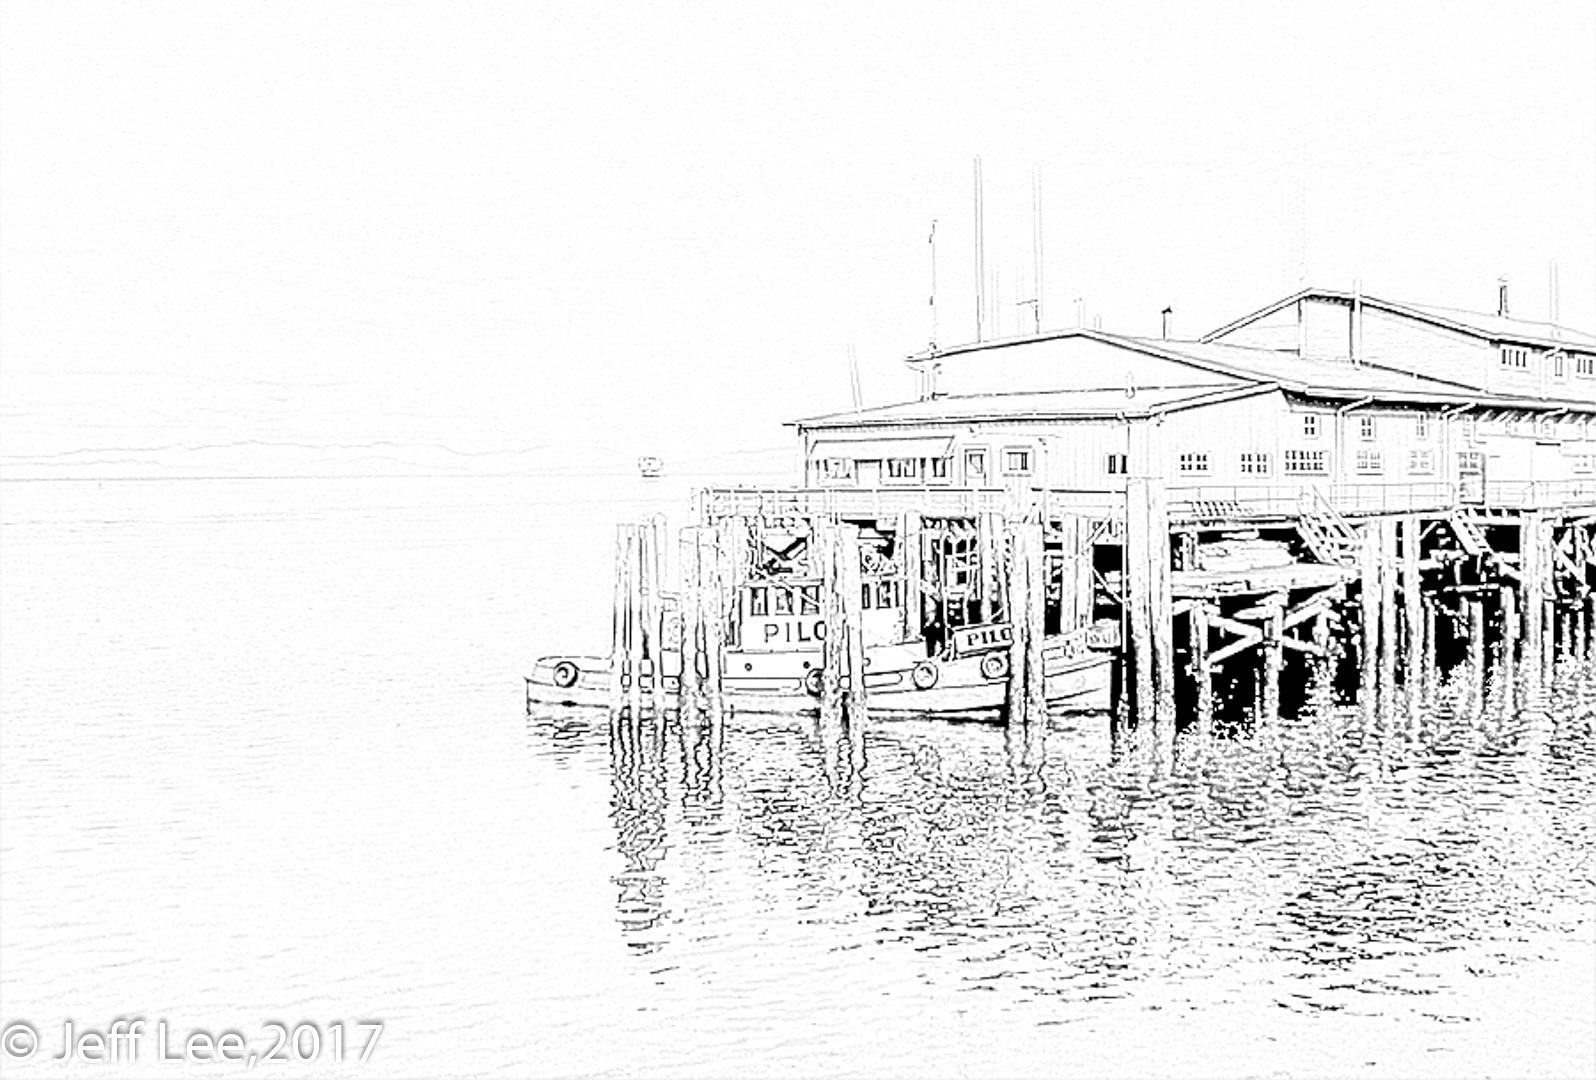 Dock Fading